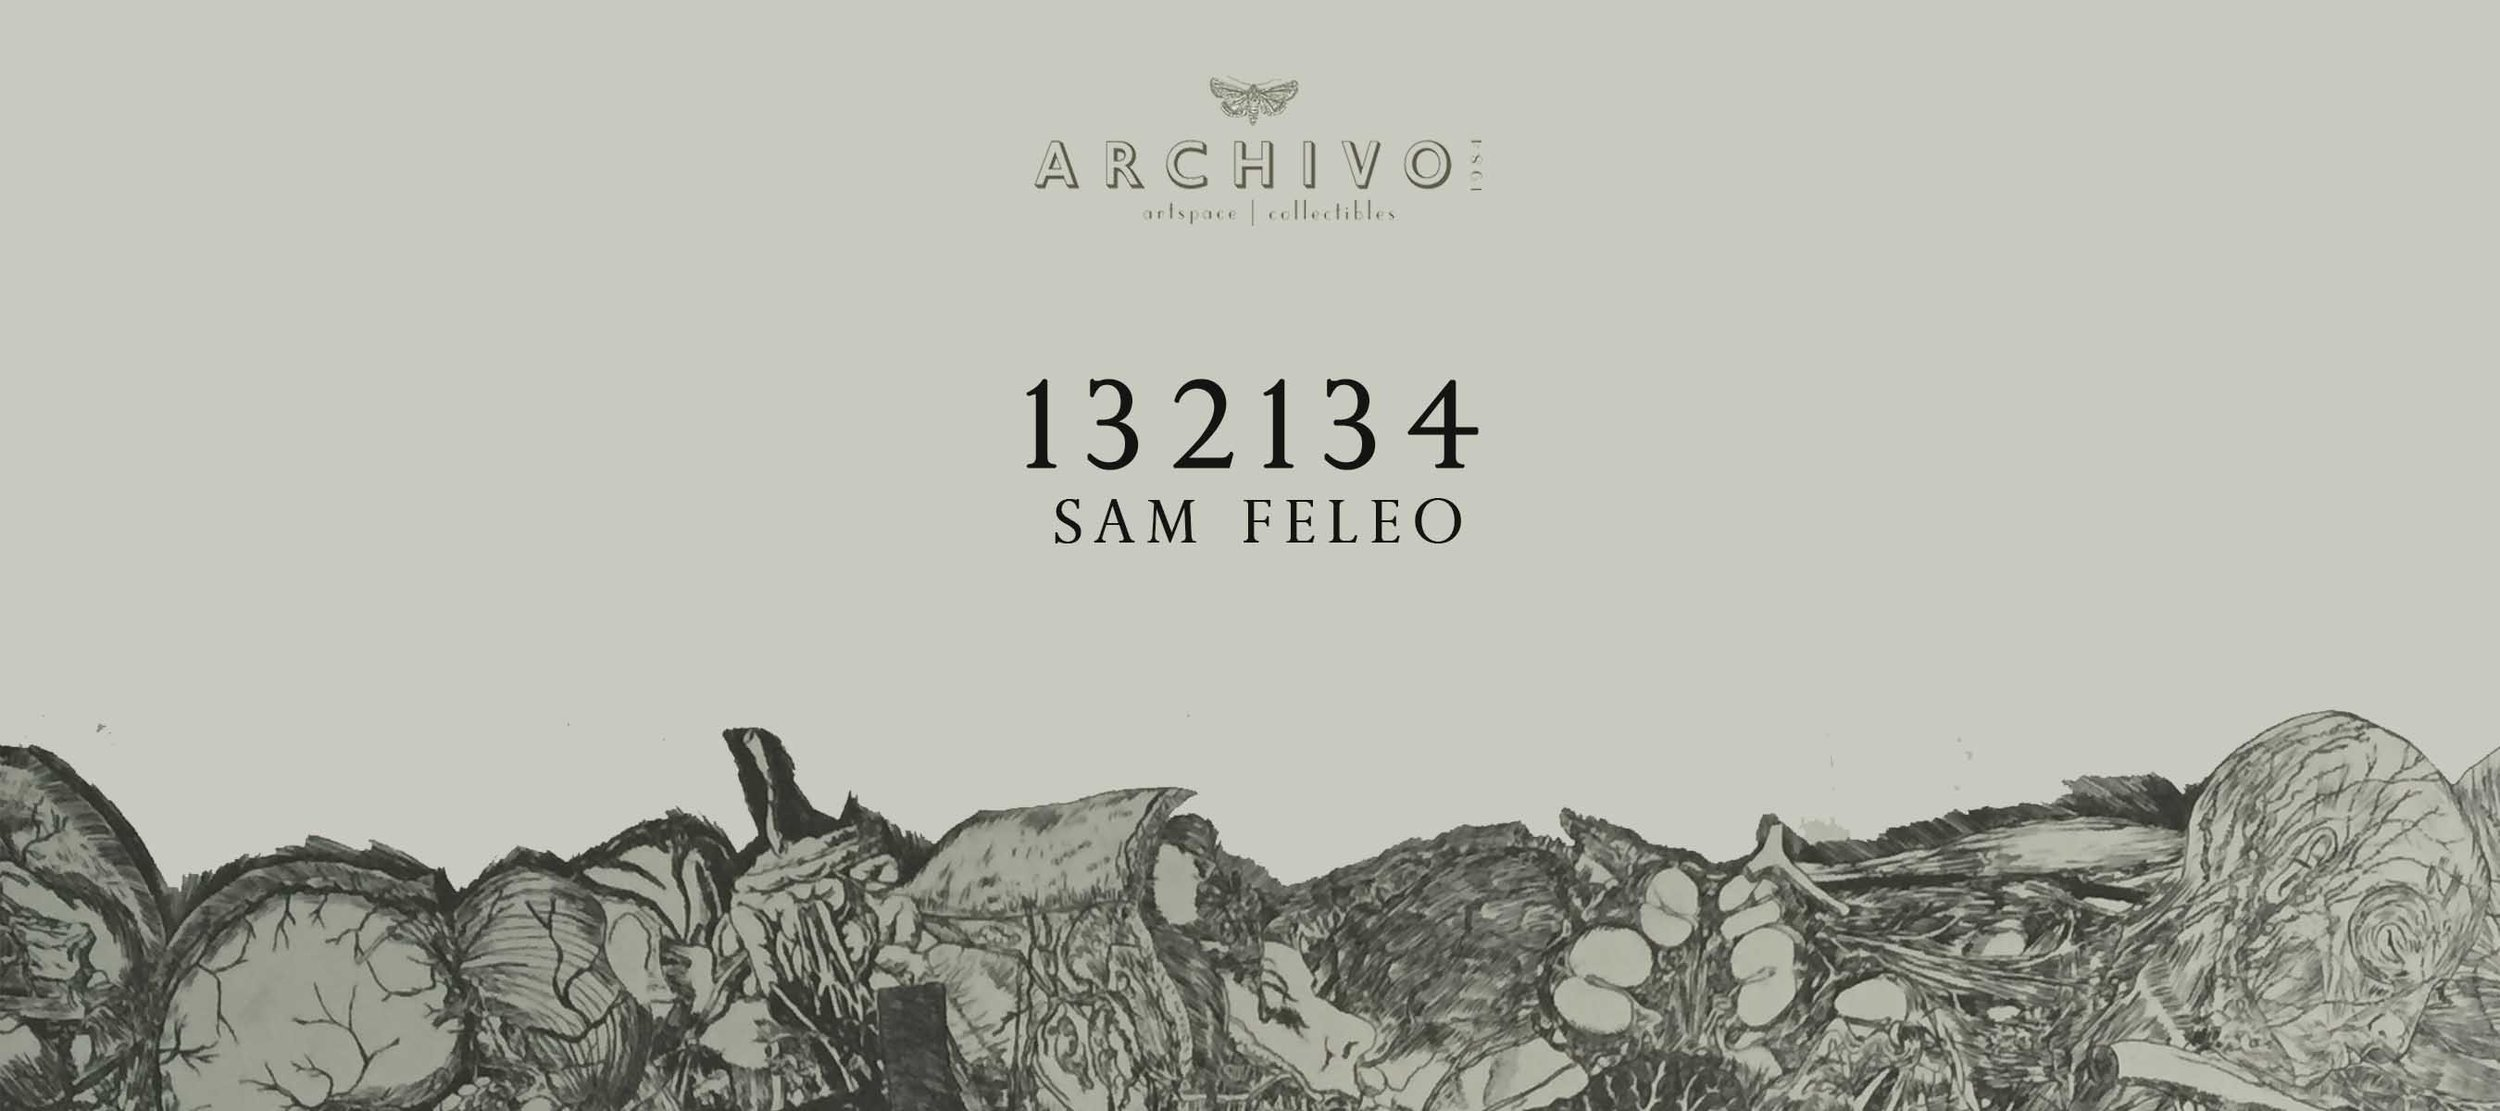 132134  Sam Feleo January 16 - February 6, 2016  Exhibition Link